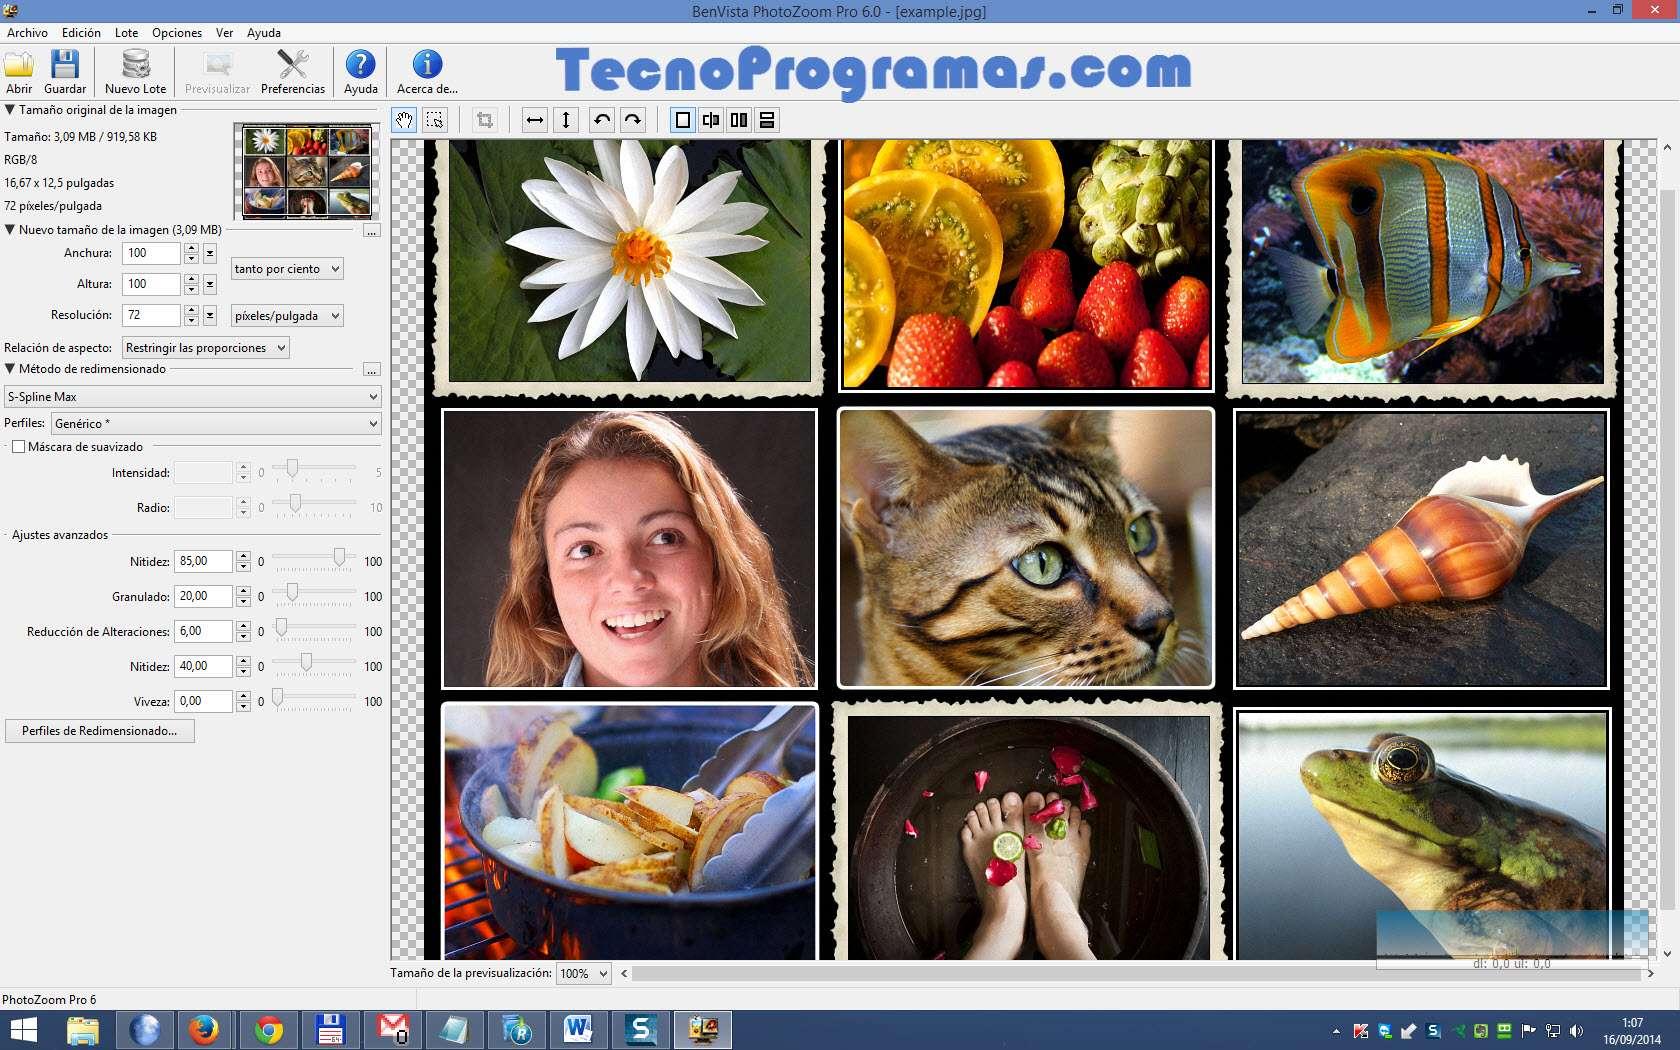 http://imagizer.imageshack.us/a/img540/1667/sOXQNH.jpg